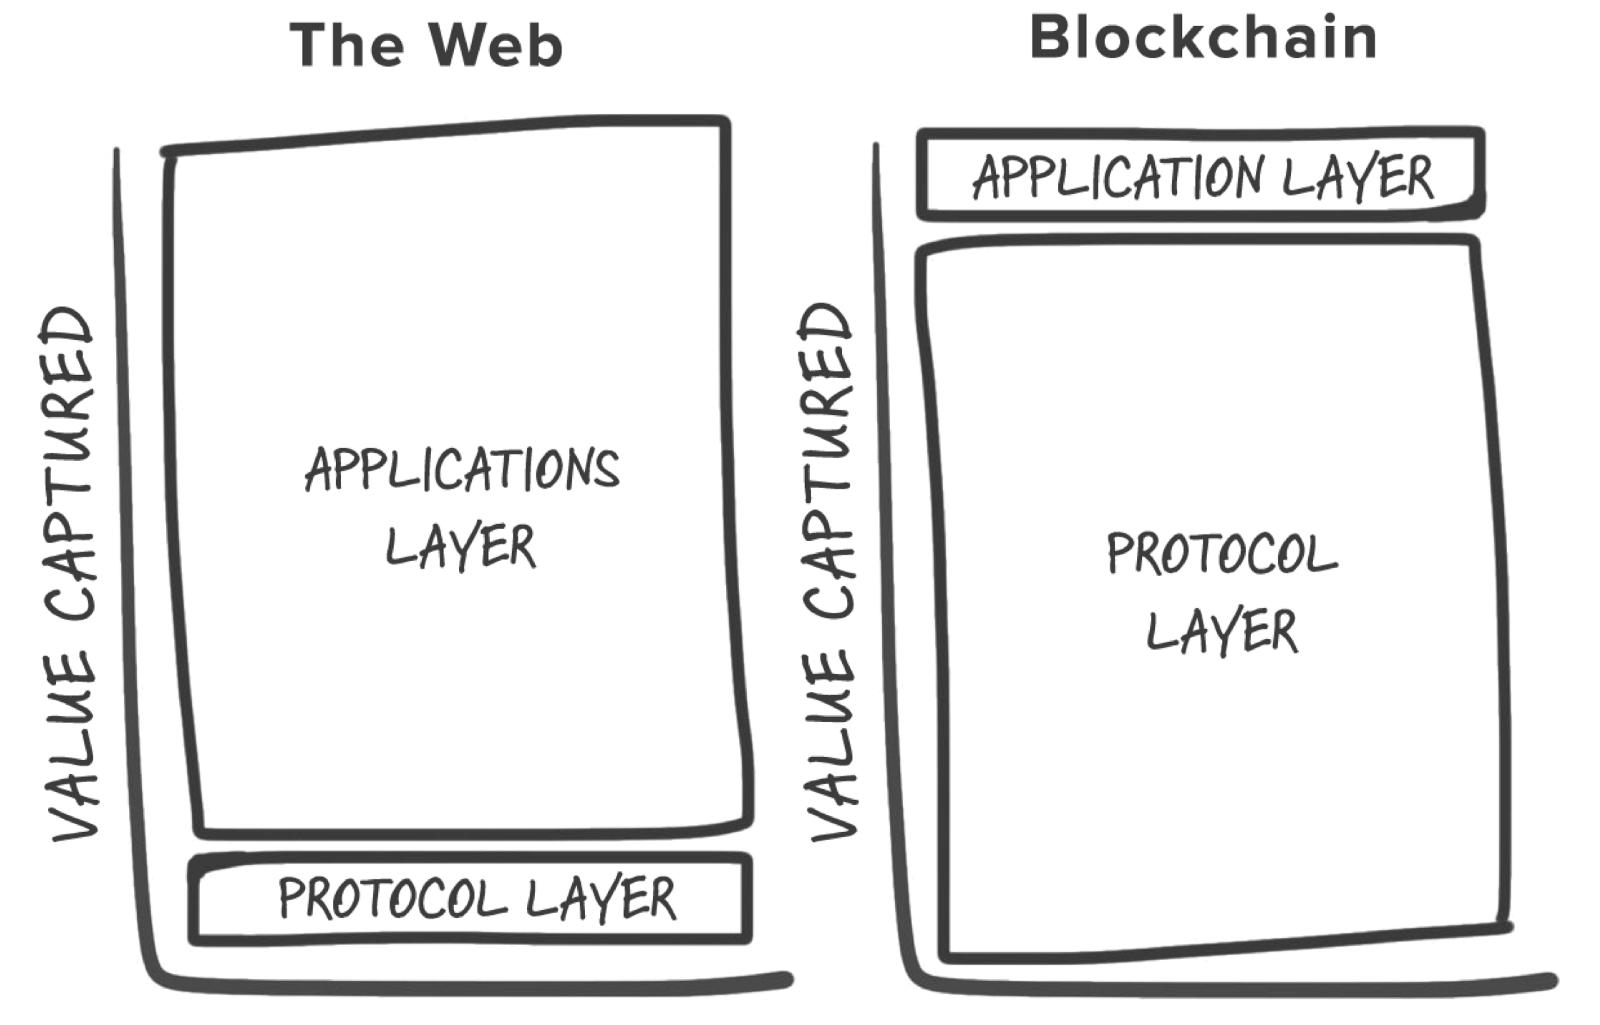 cameron-mclain-capture-analysis-web-blockhain.png